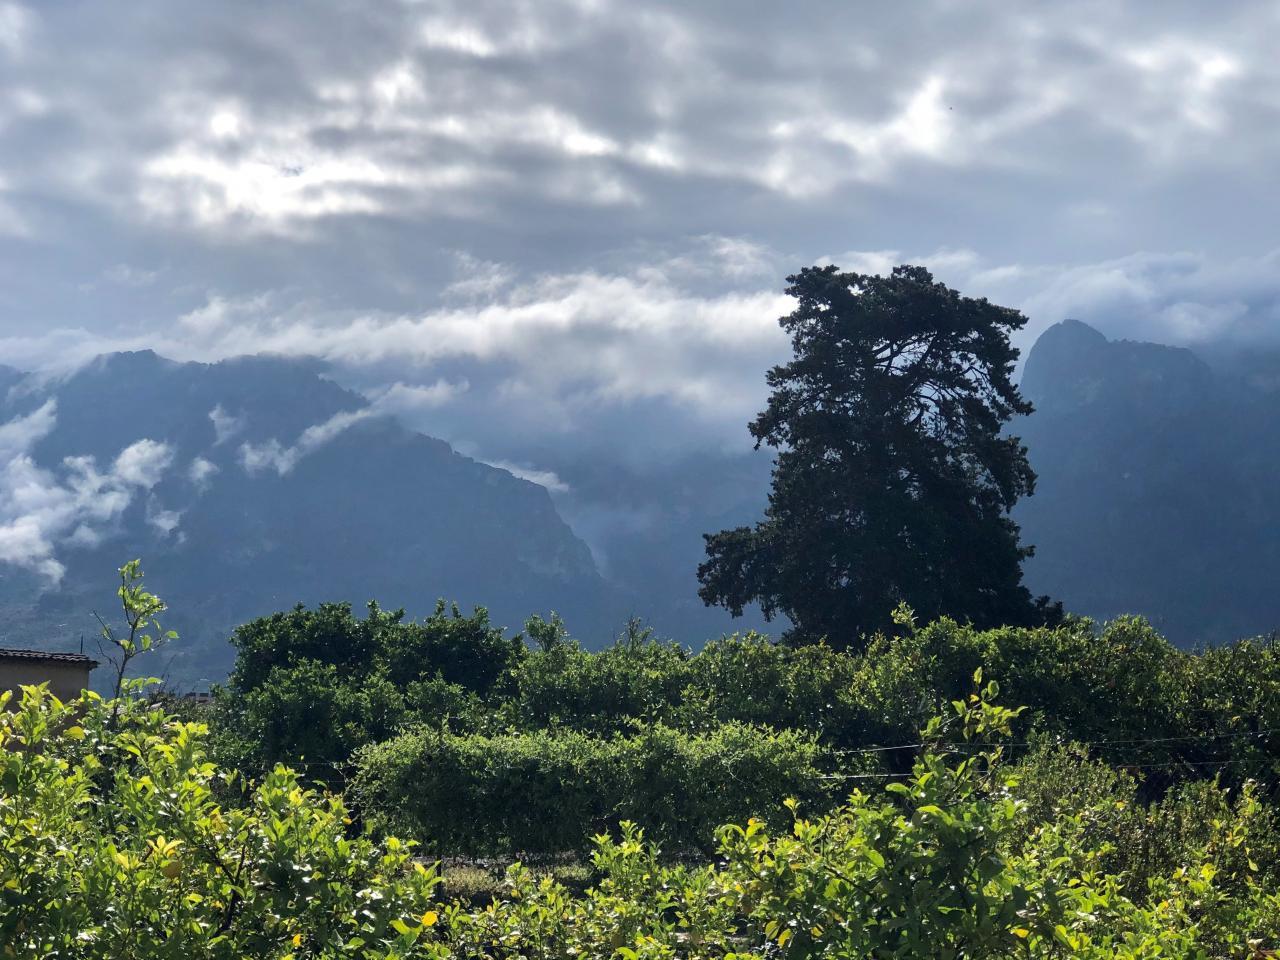 Quiet mountains